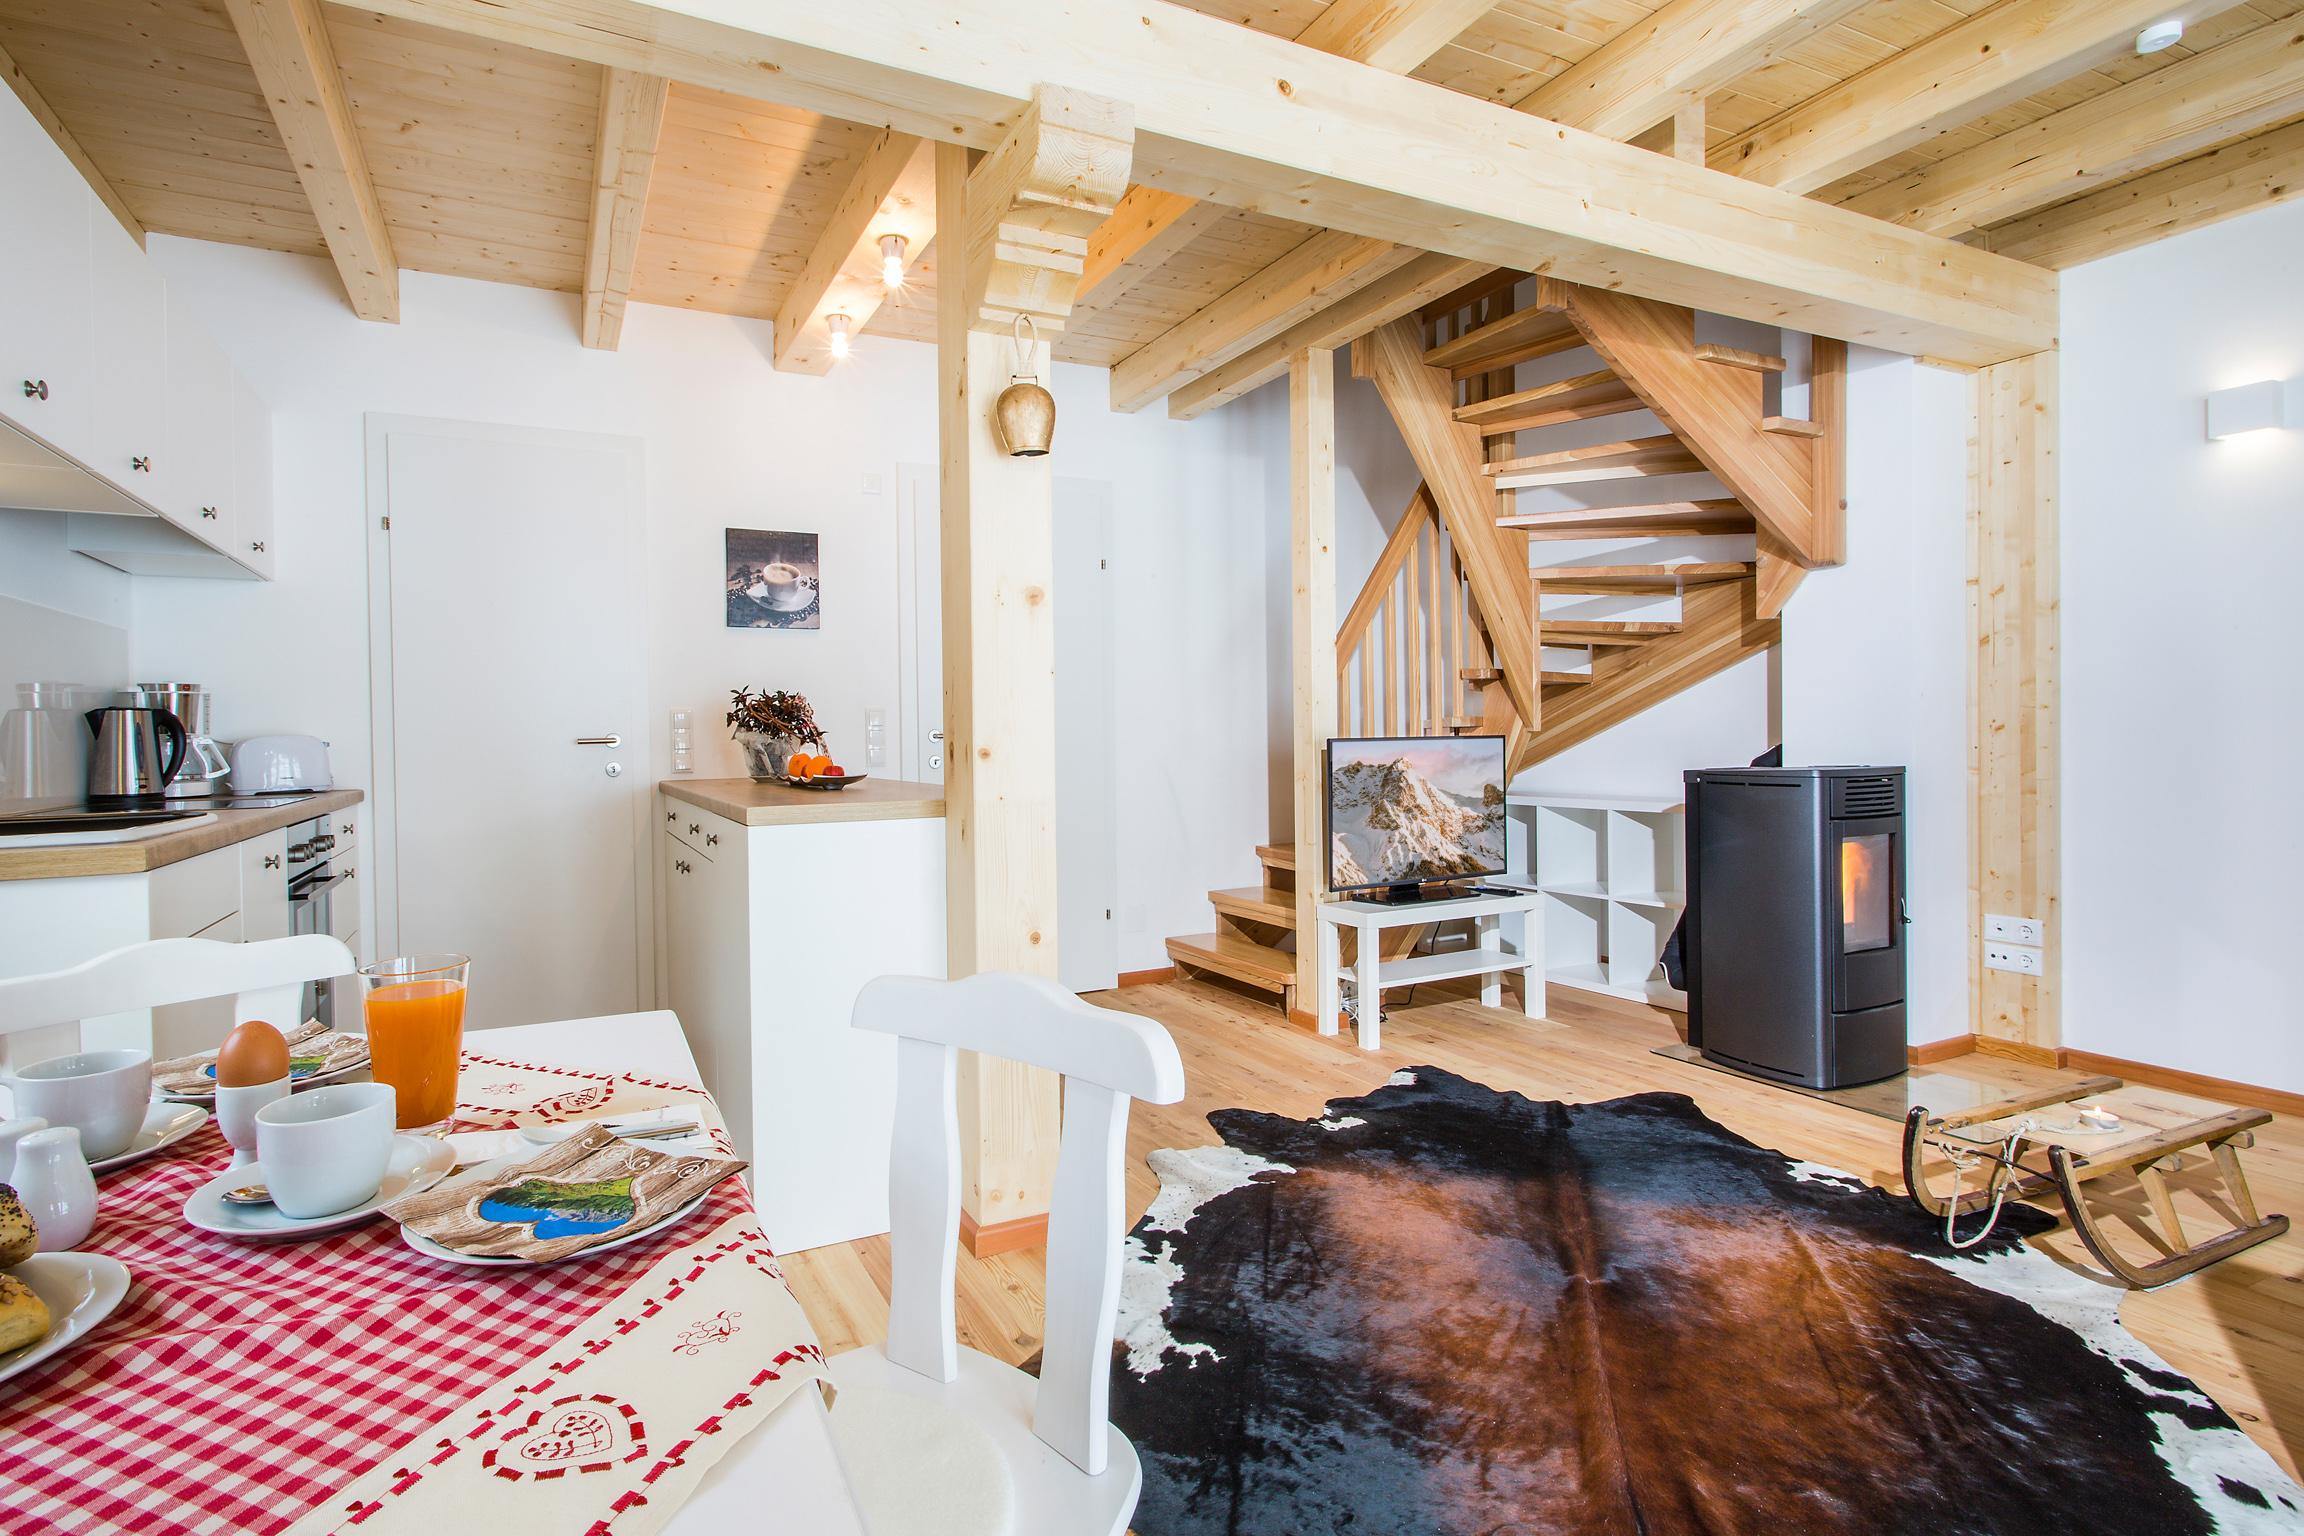 Maison de vacances Lodge Kleiner Bär direkt am Skilift (2050394), Uttendorf, Pinzgau, Salzbourg, Autriche, image 20